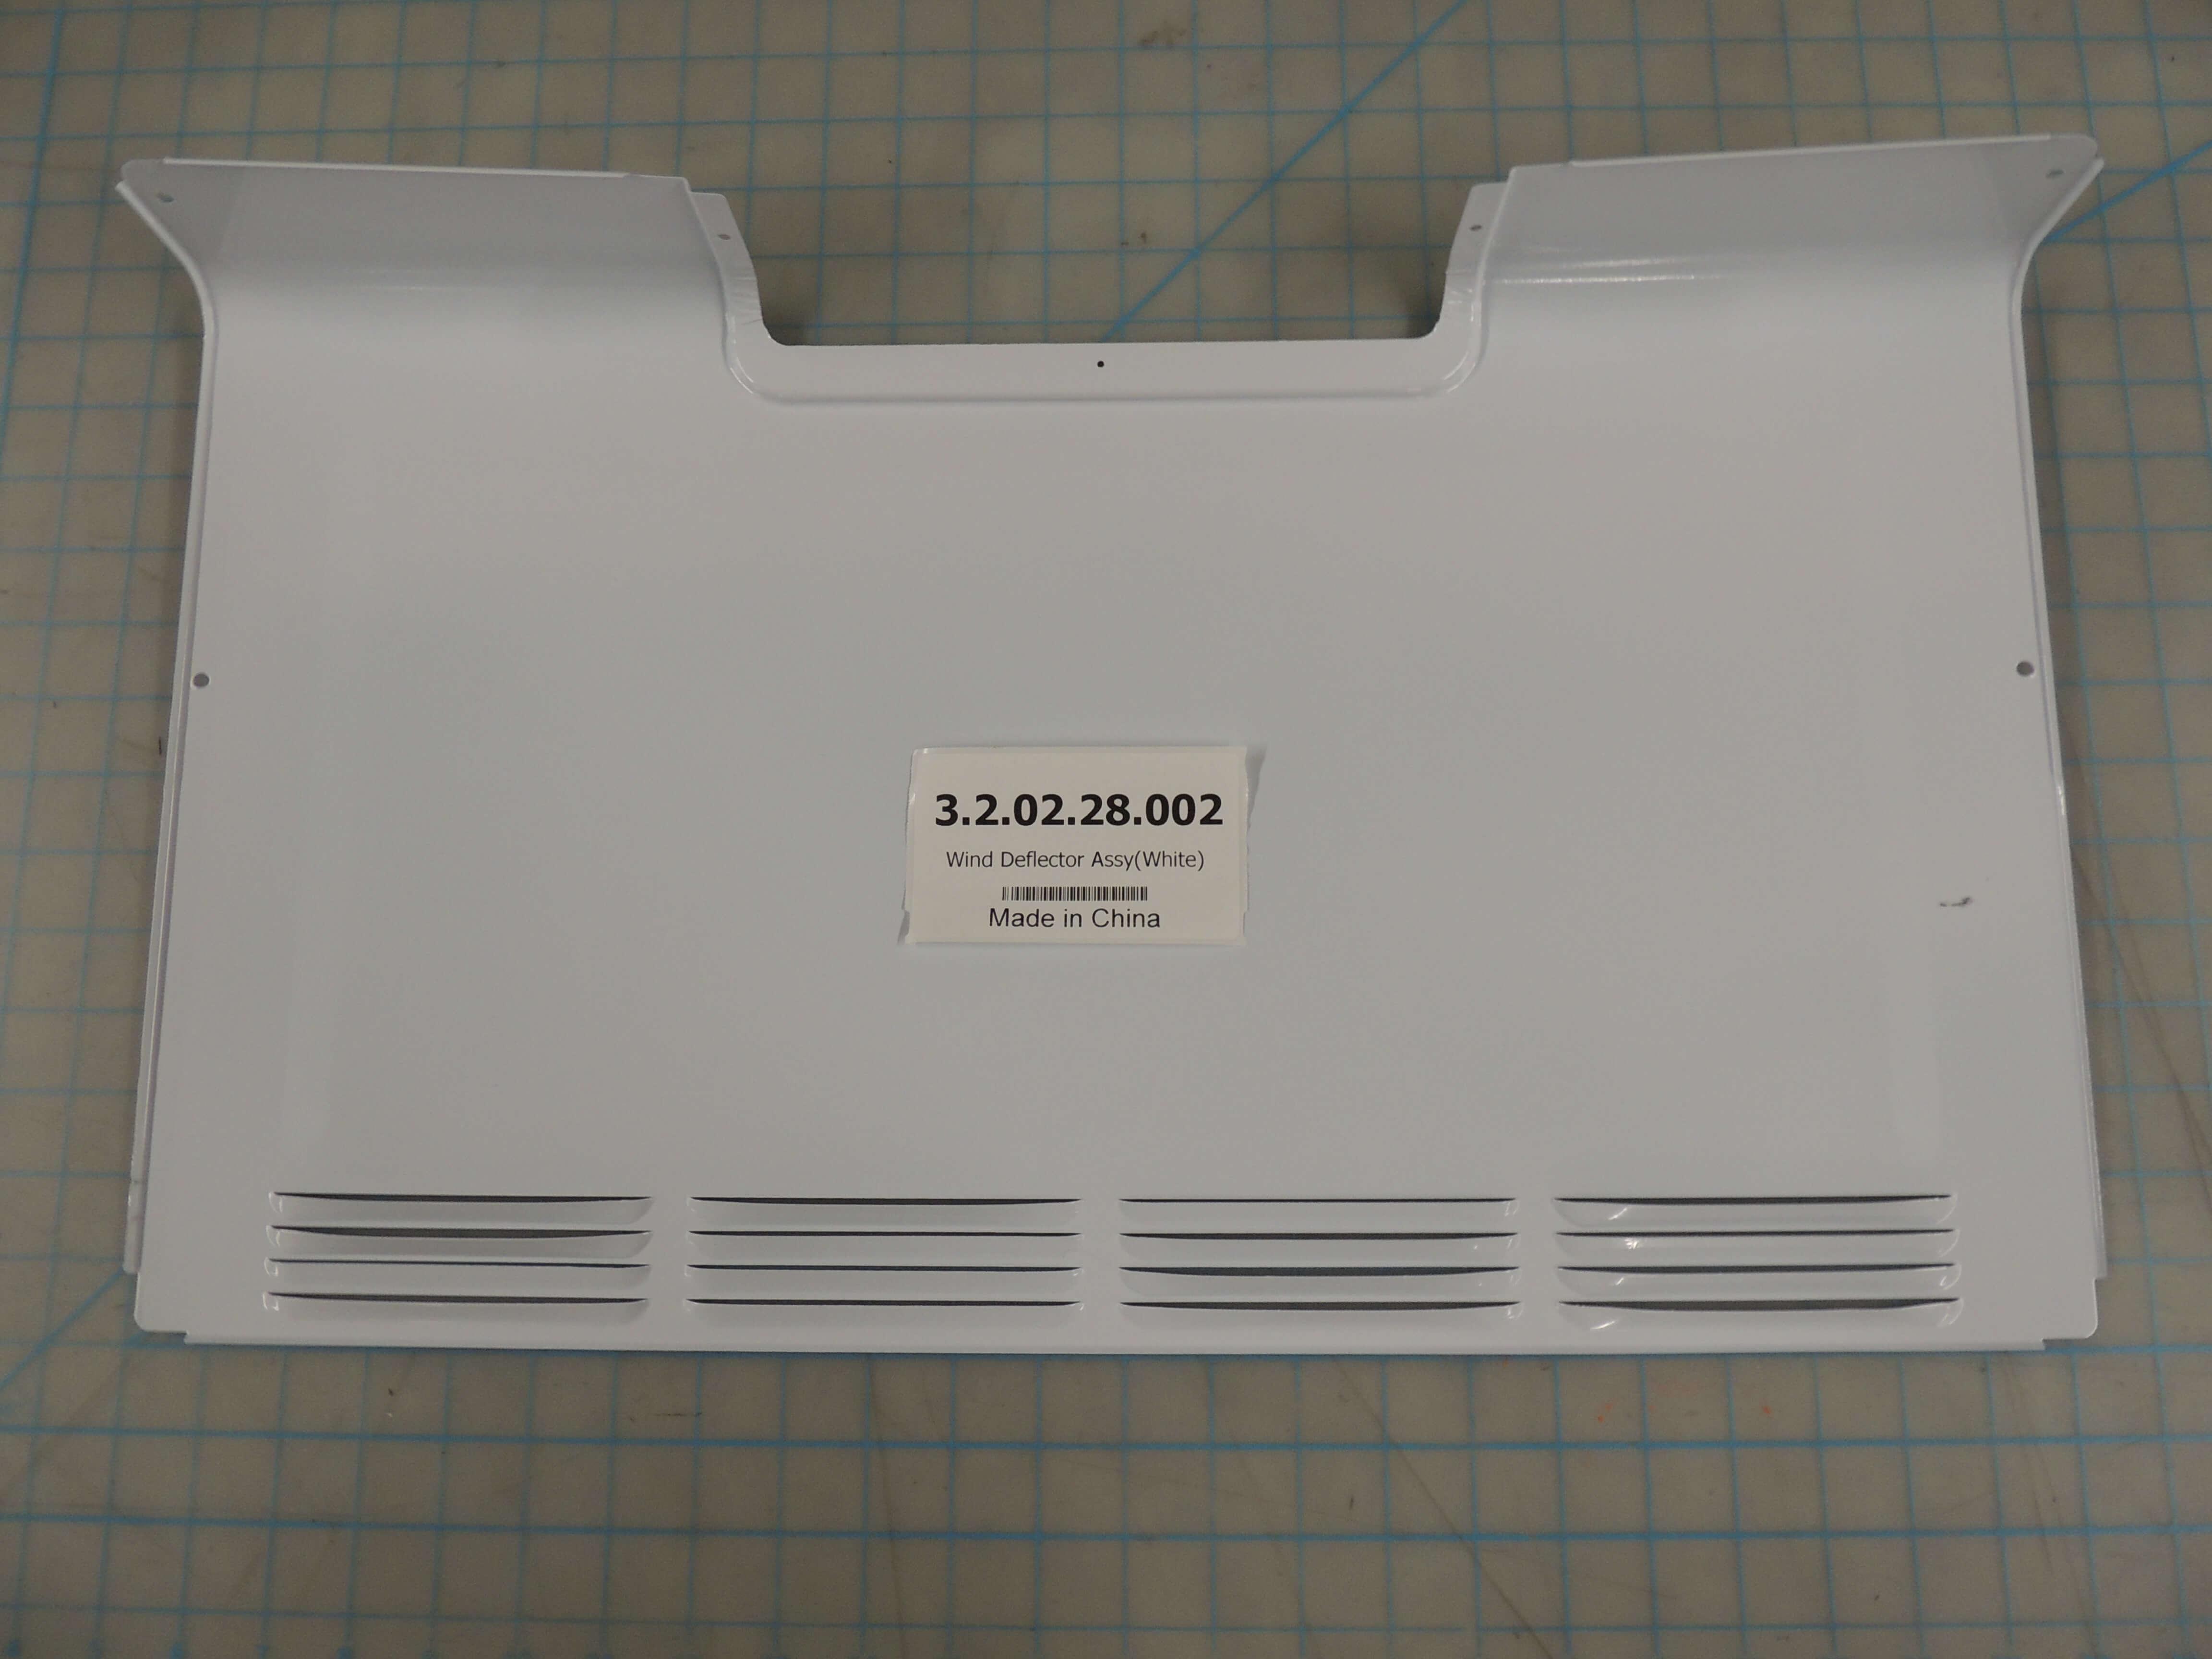 Wind Deflector Assy(White)